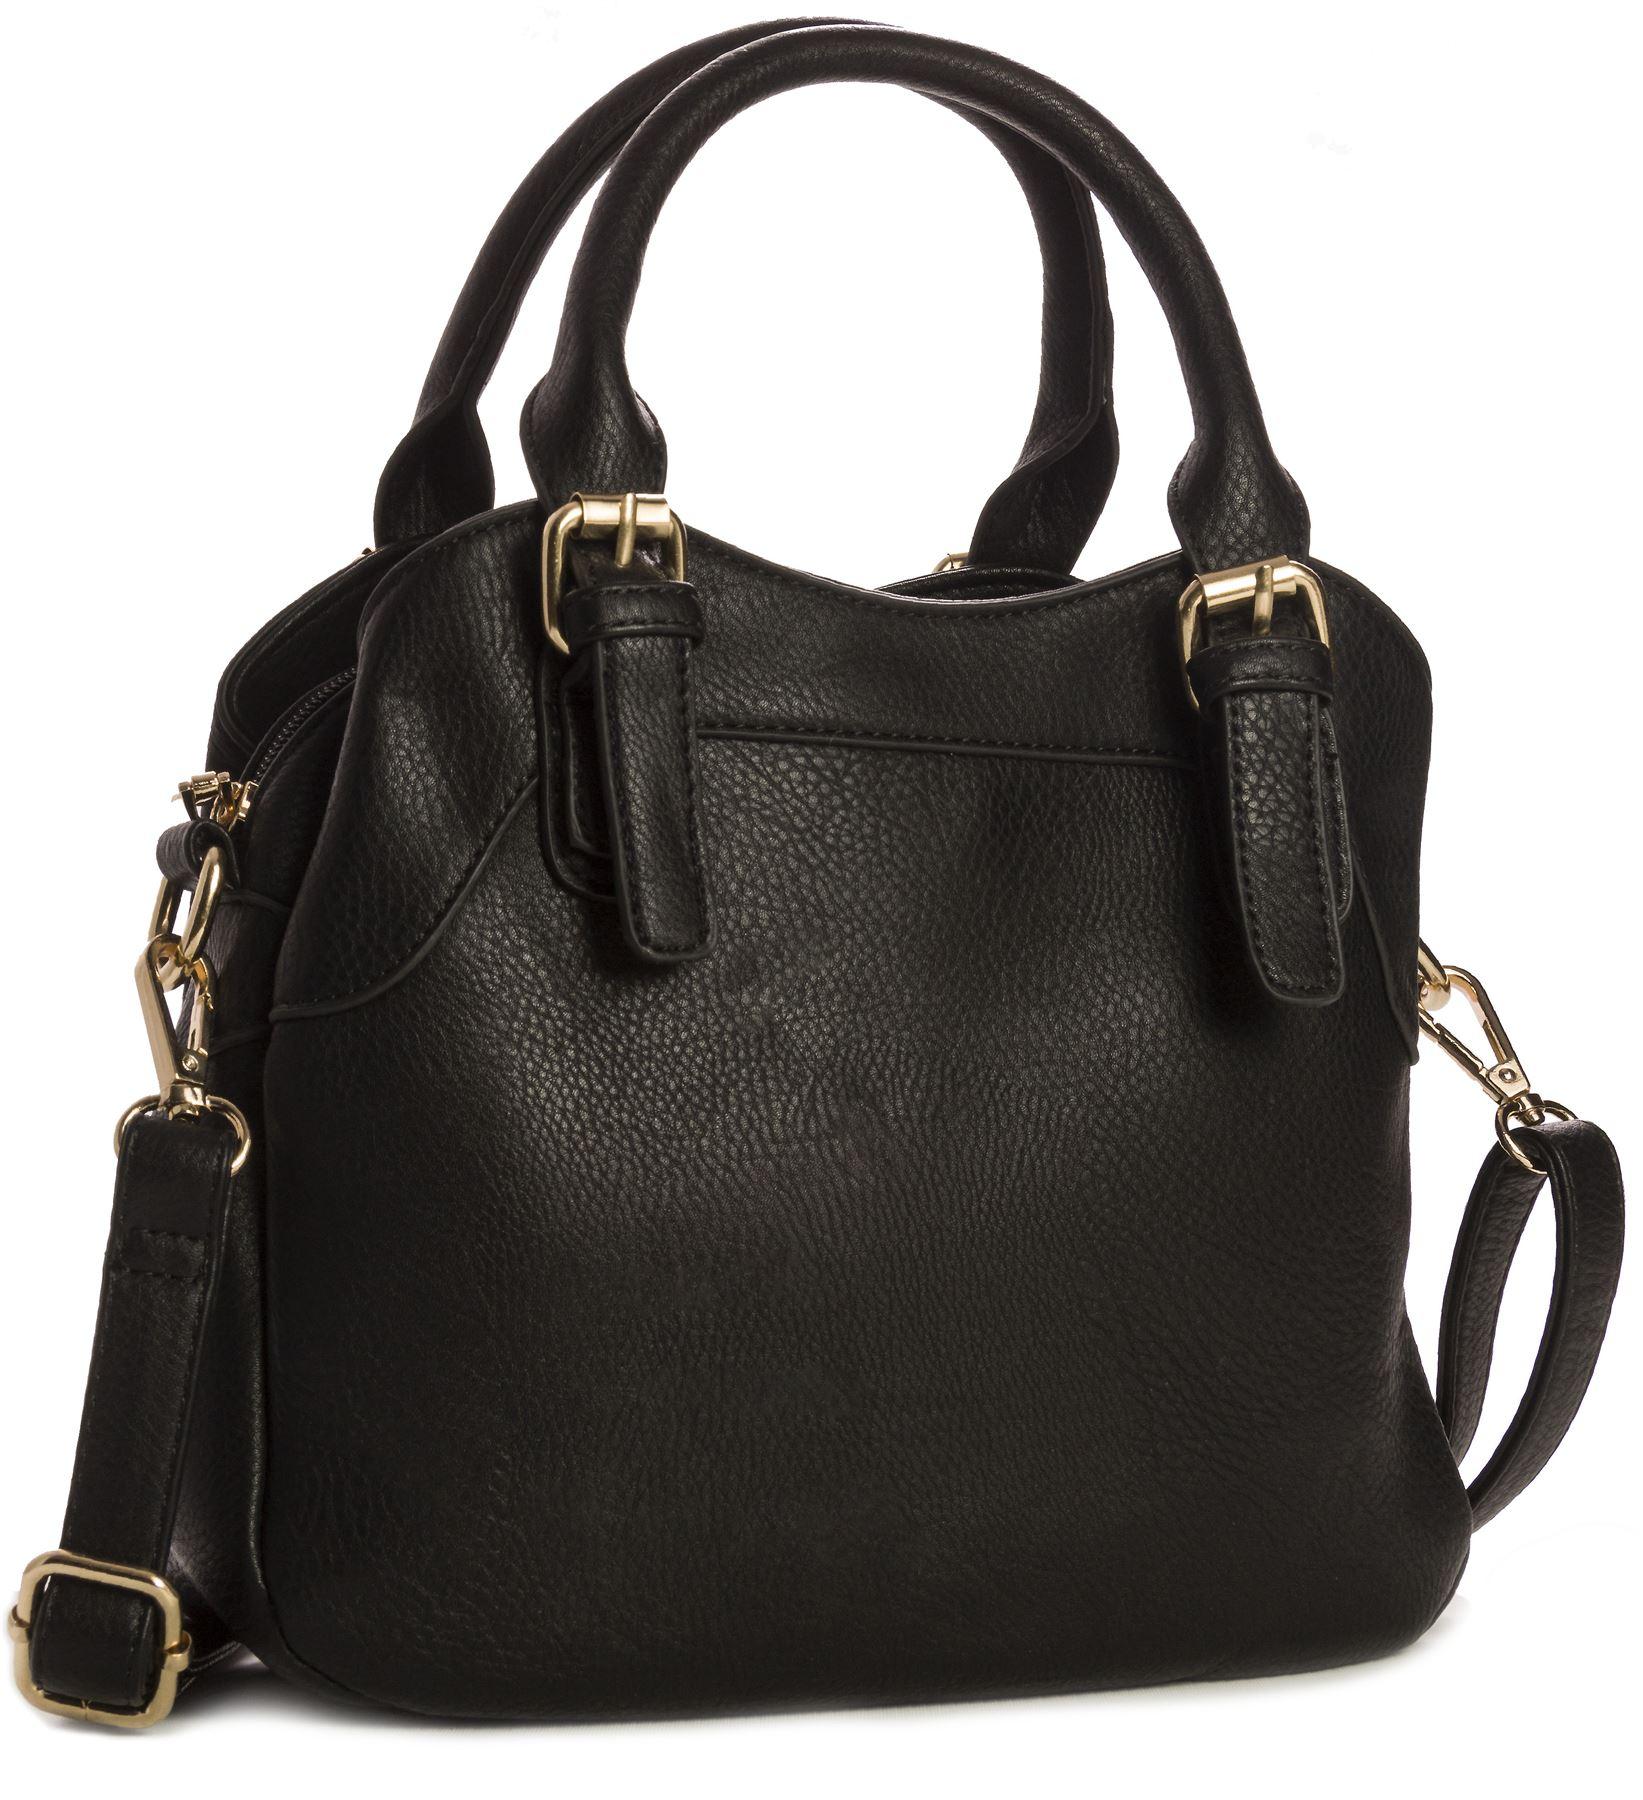 Top Five Designer Handbag Brands  Top Designer Handbags